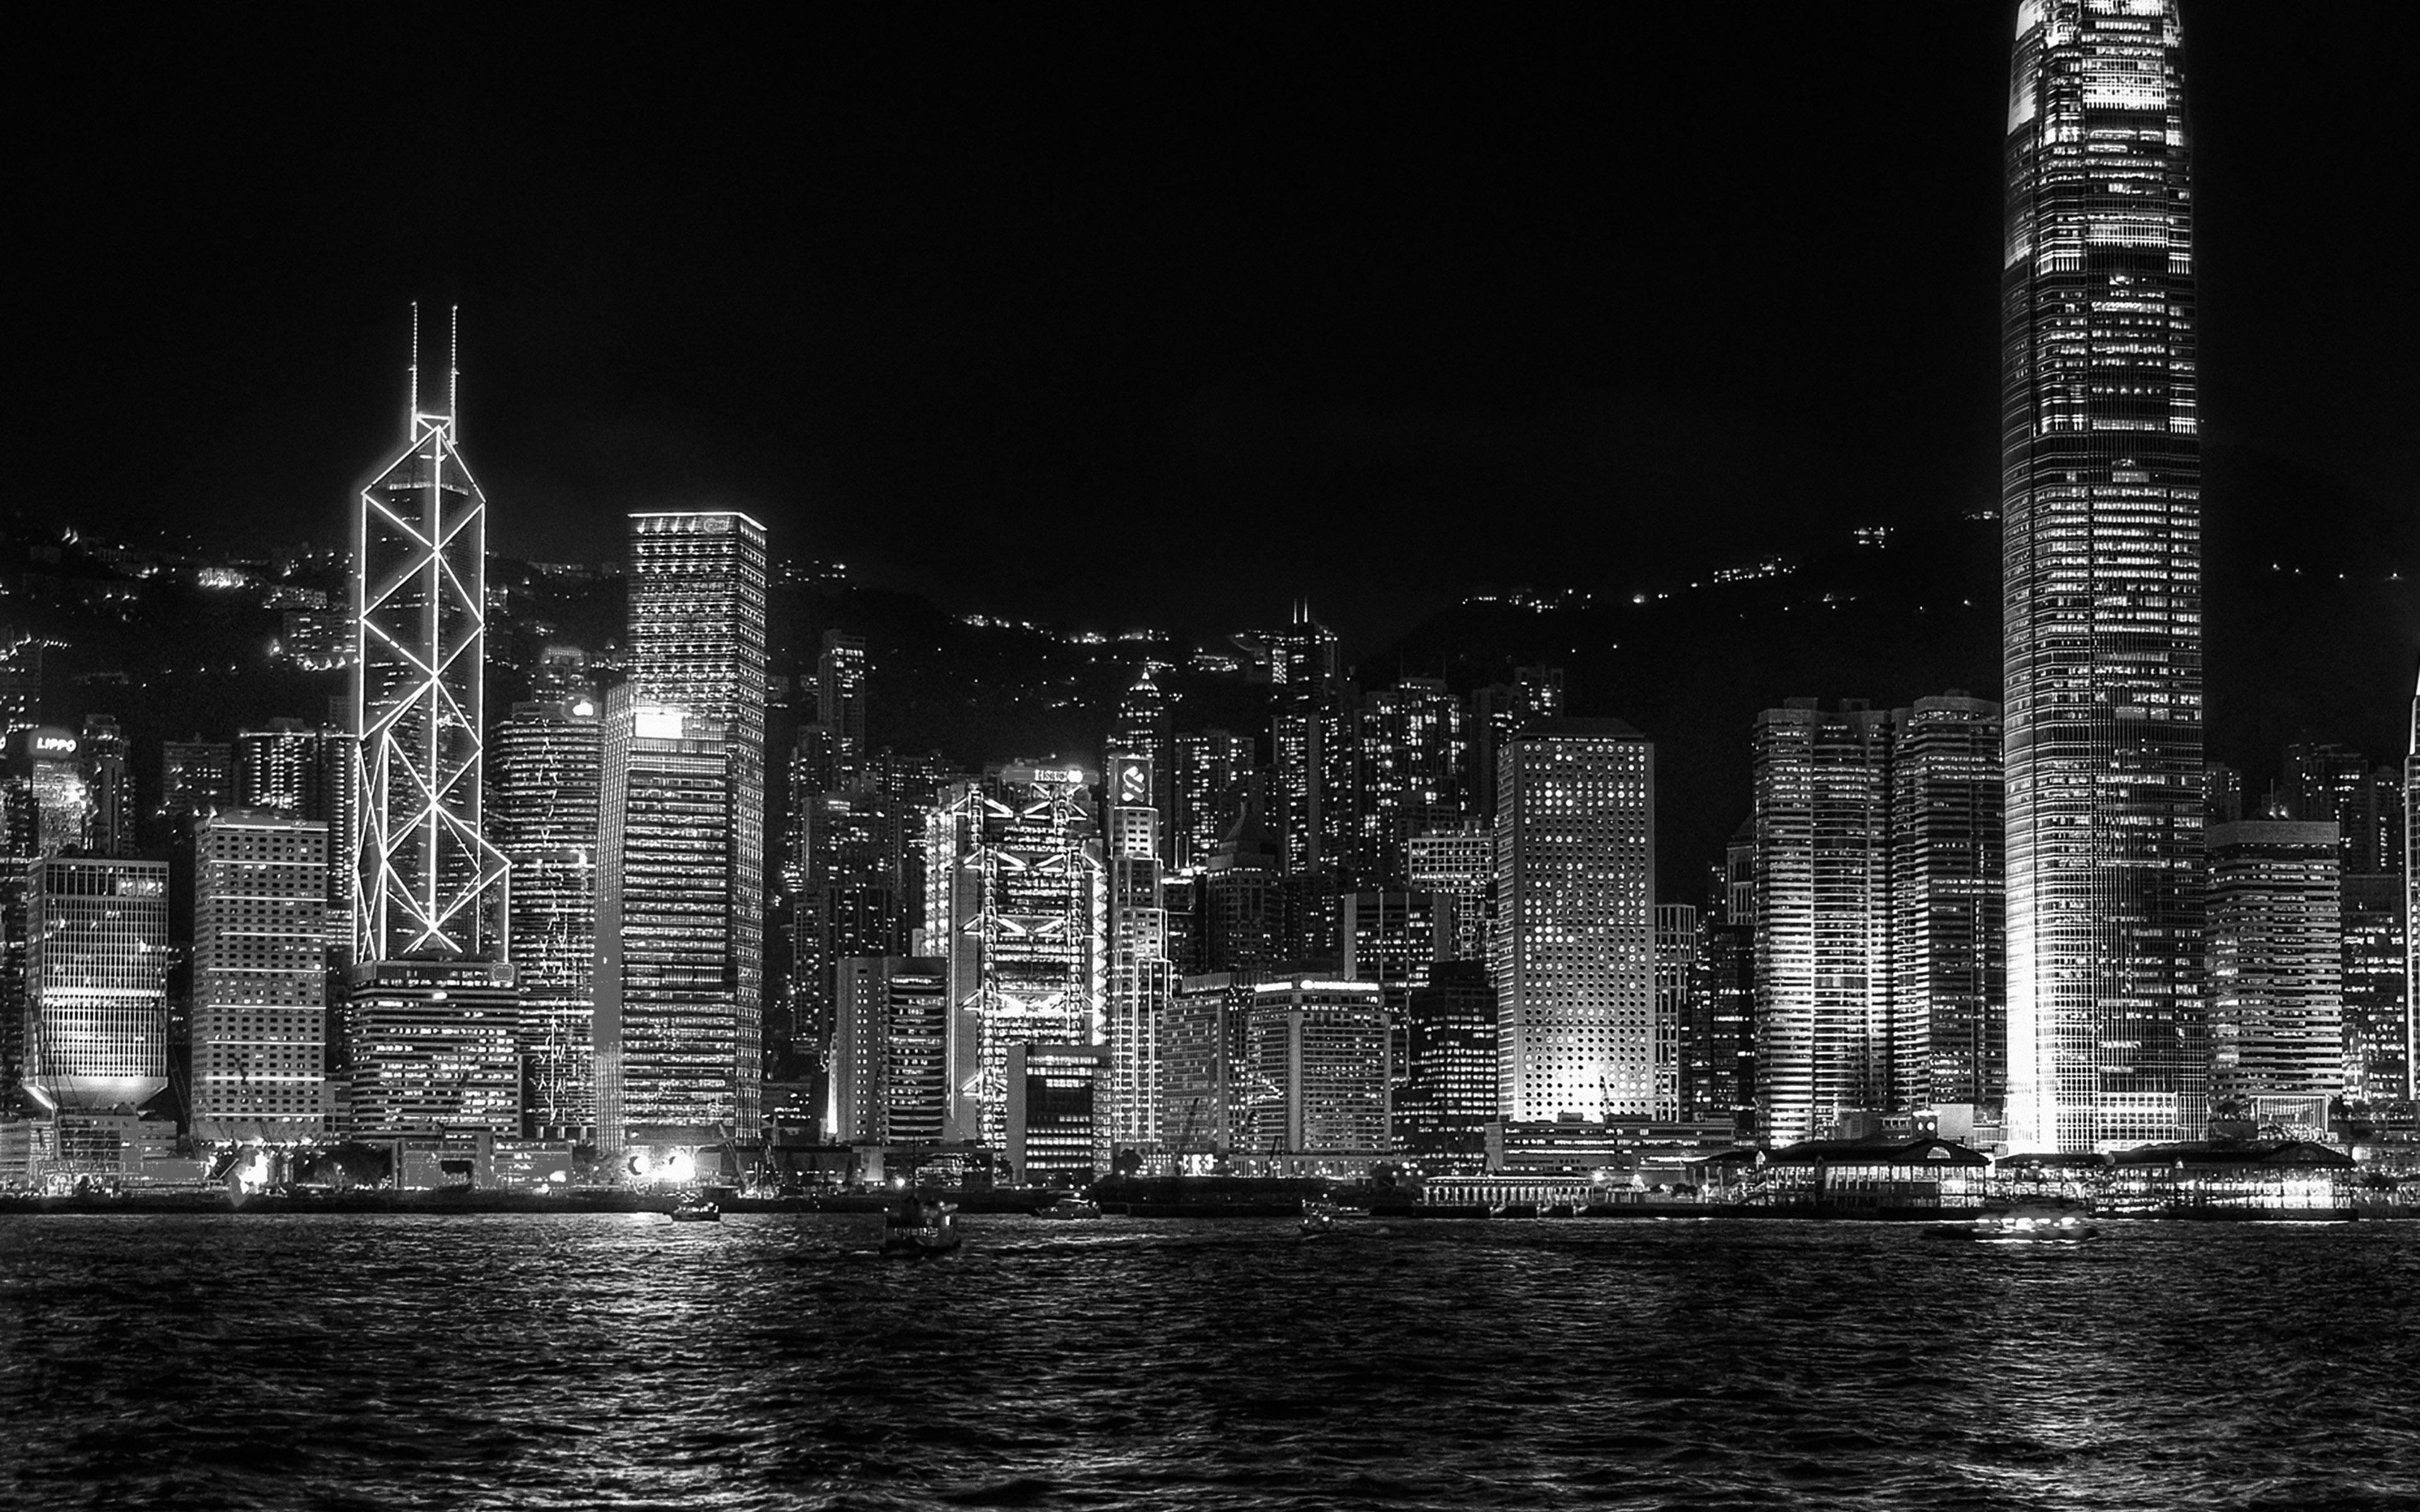 mh95-hongkong-night-symposium-of-light-dark-wallpaper